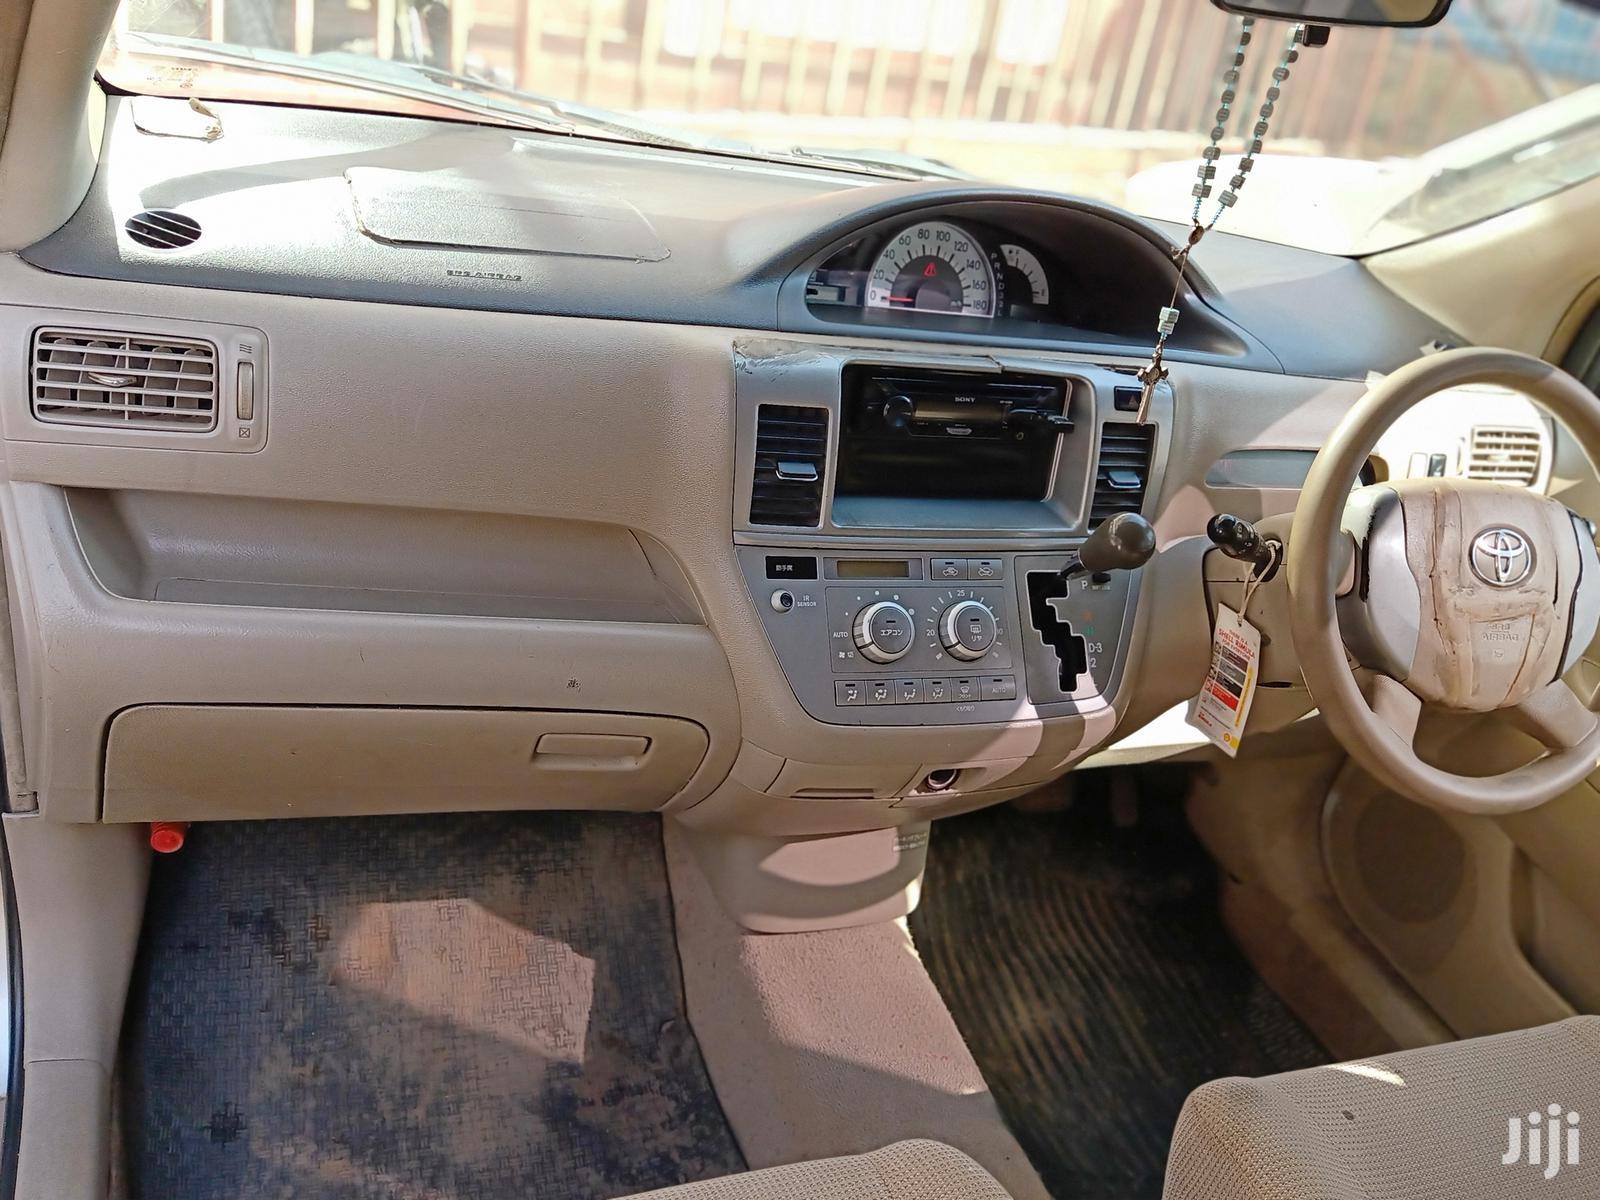 Archive: Toyota Raum 2005 Gold